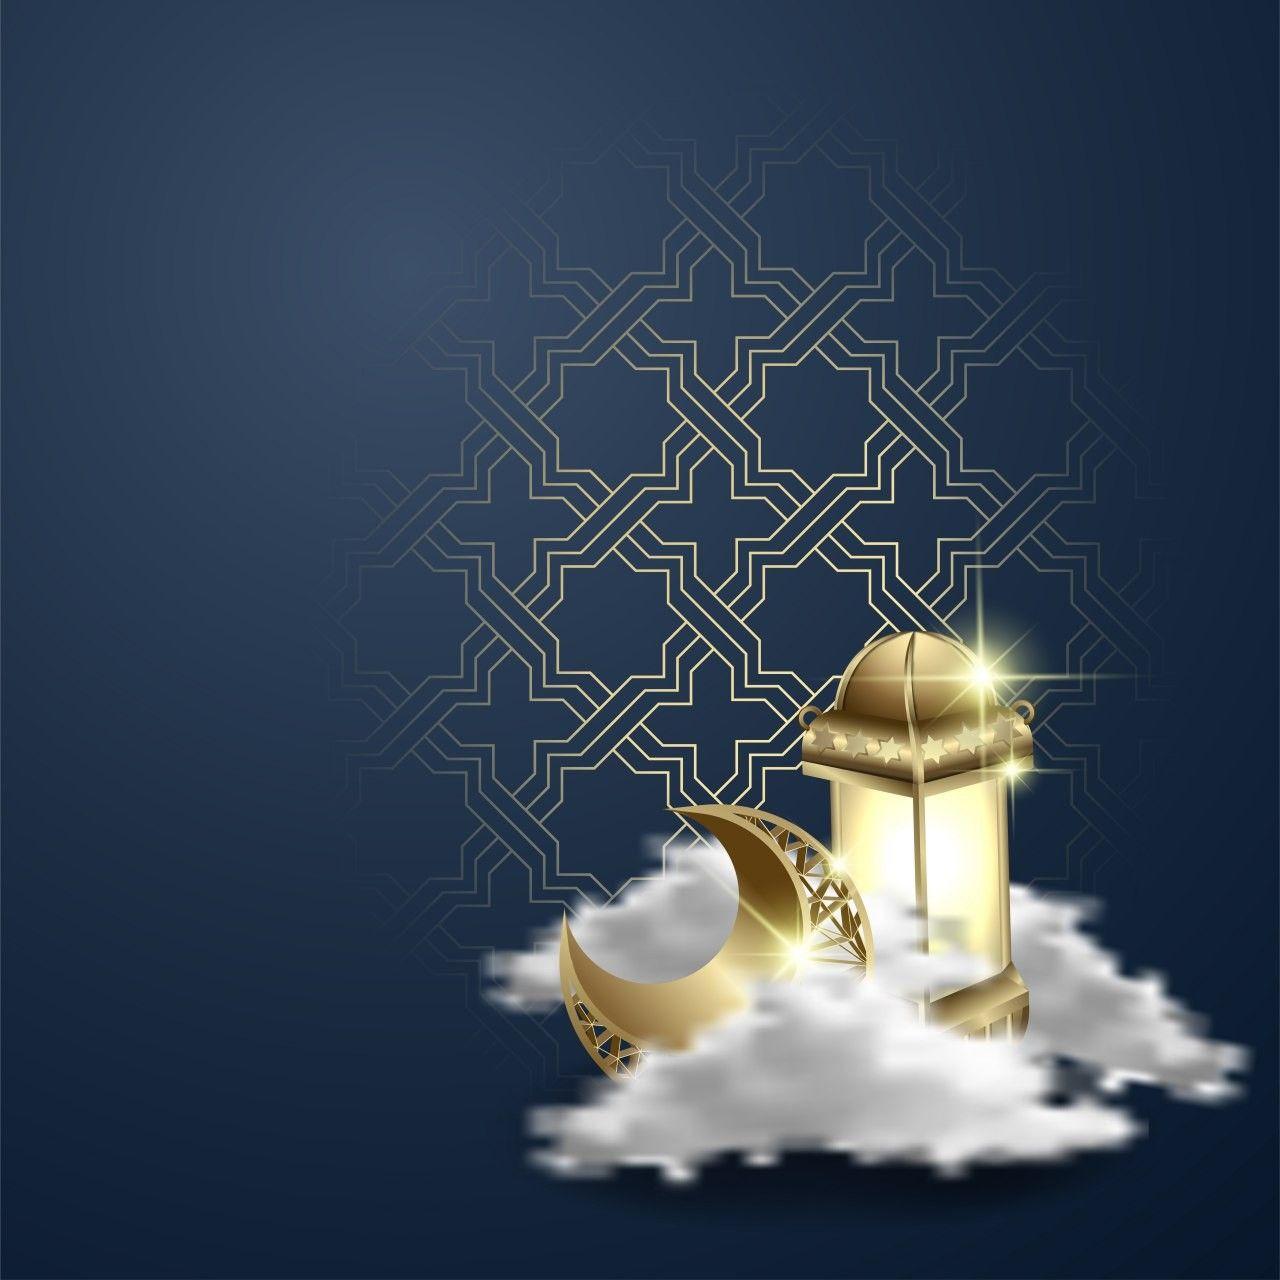 Pin Oleh Rany Melad Di Ramadan Ilustrasi Poster Seni Islamis Seni Kaligrafi